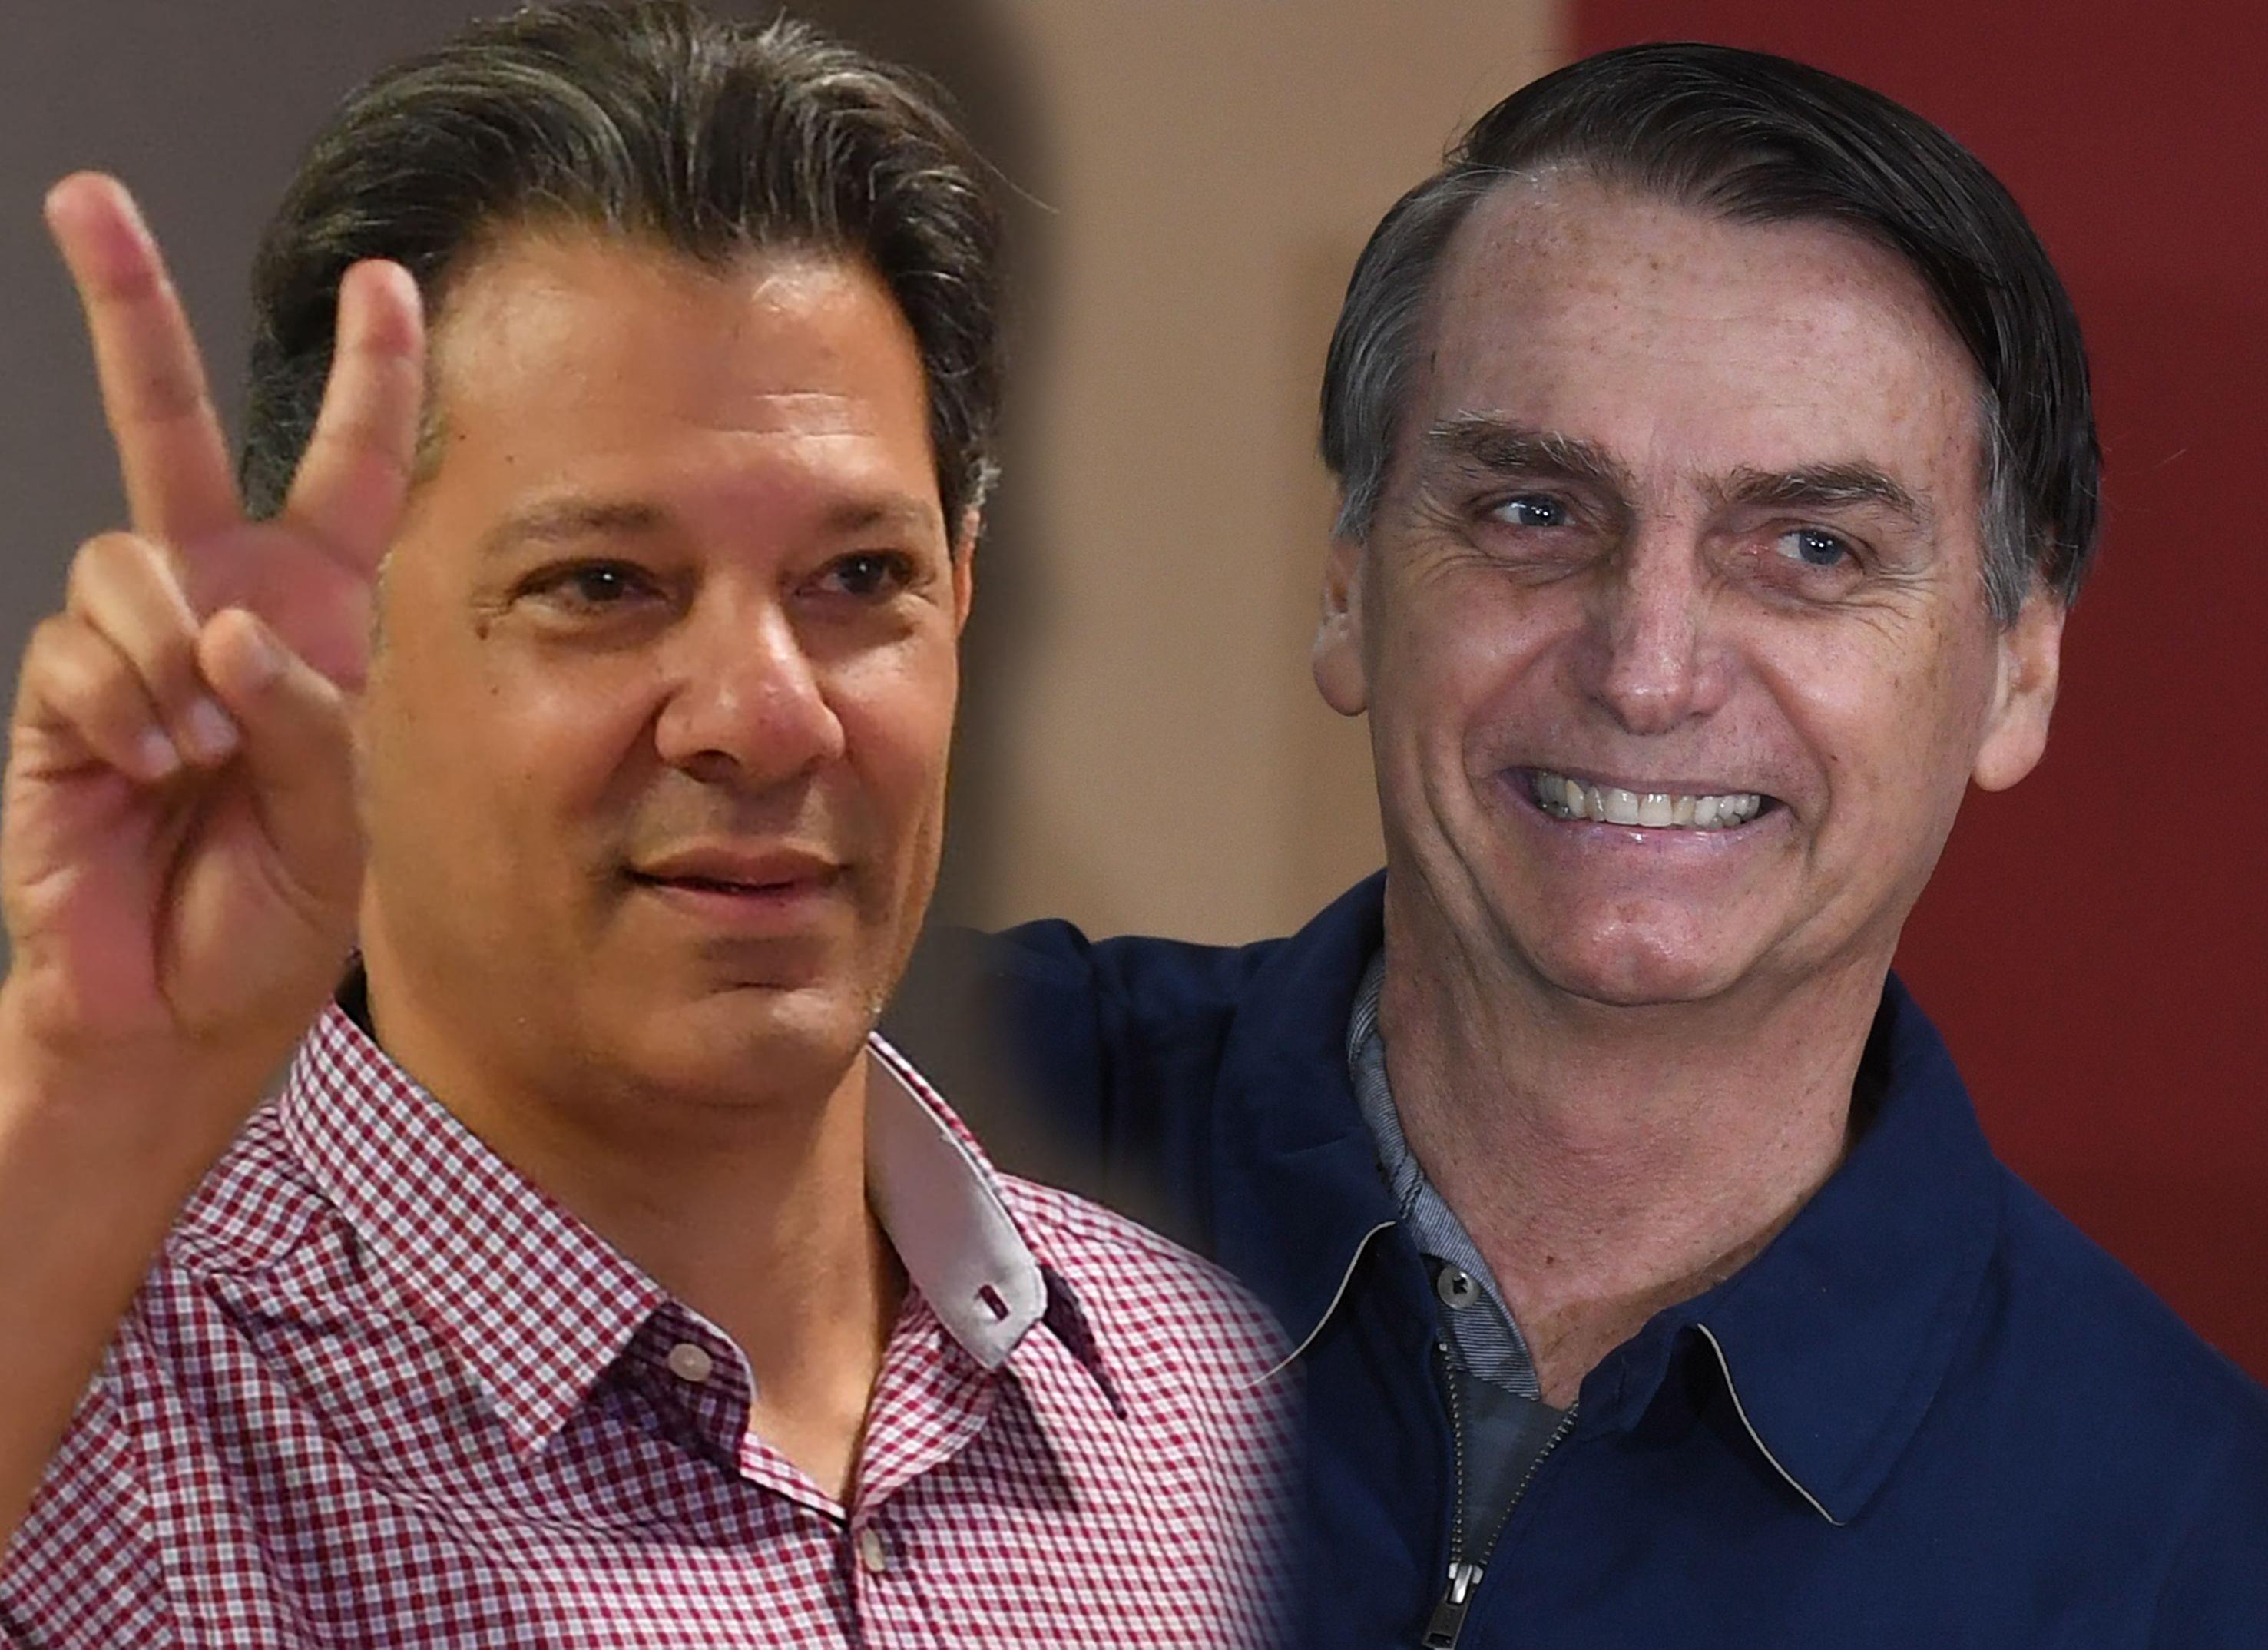 Bolsonaro e Haddad vão disputar o 2.º turno